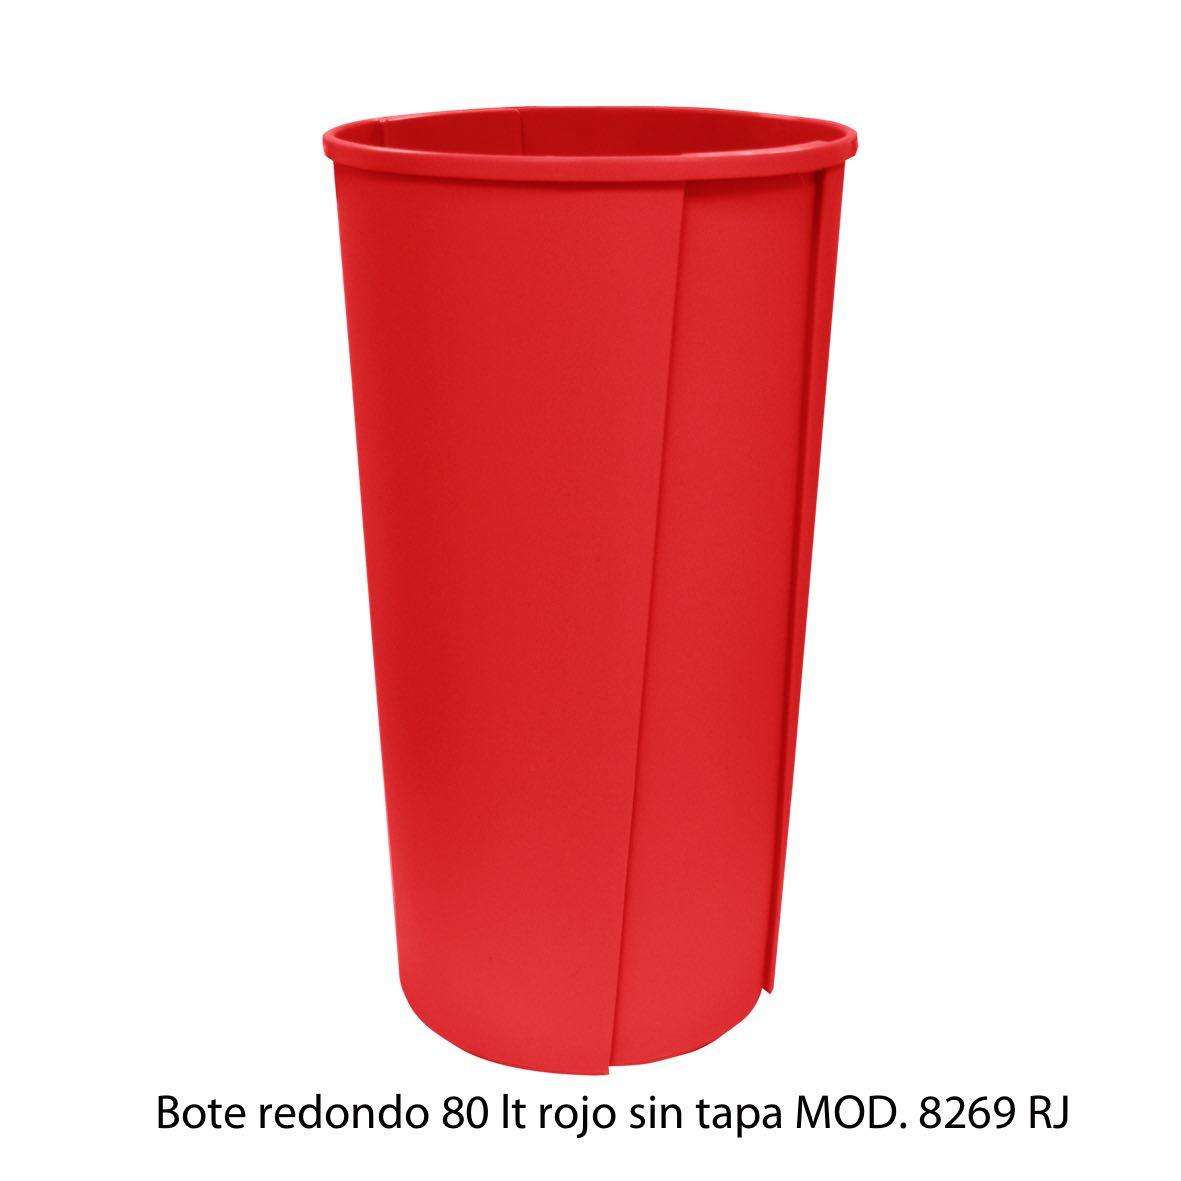 Bote de basura redondo sin tapa de 80 litros rojo modelo 8269 RJ Sablón